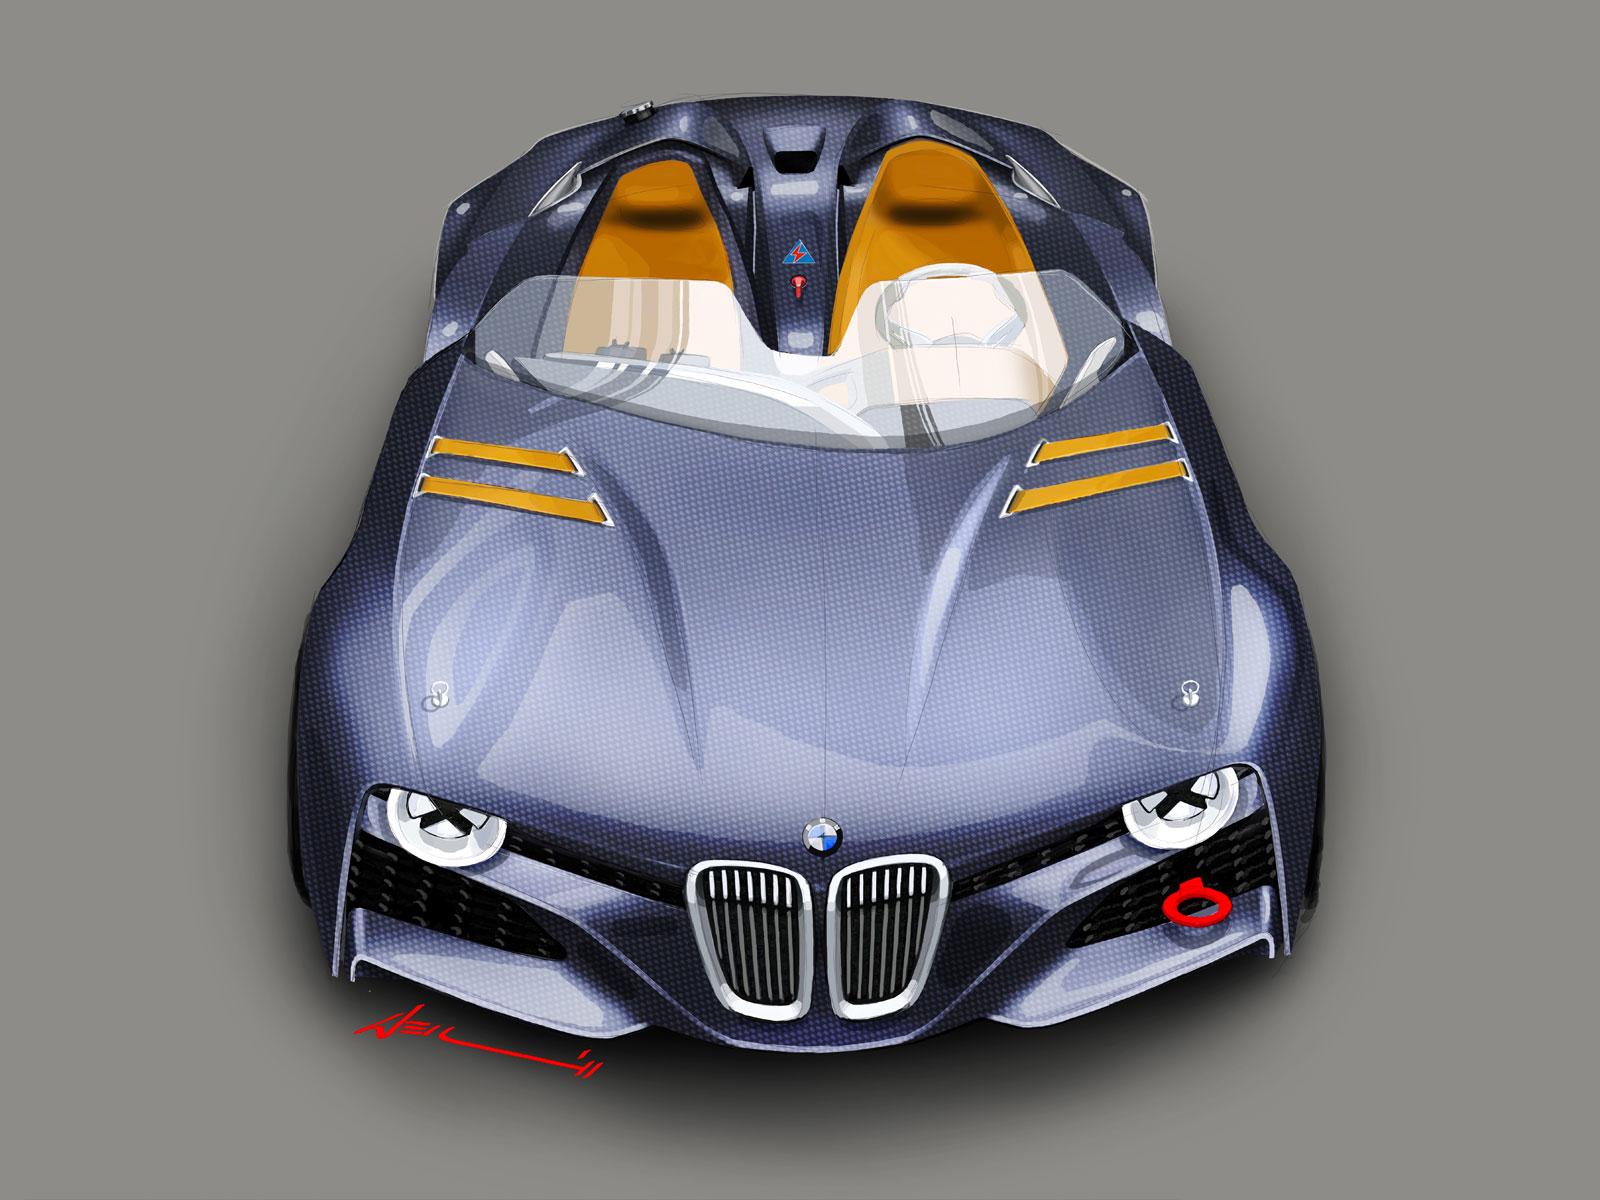 2011 BMW 328 Hommage Concept Design Sketch Render by Christopher ...